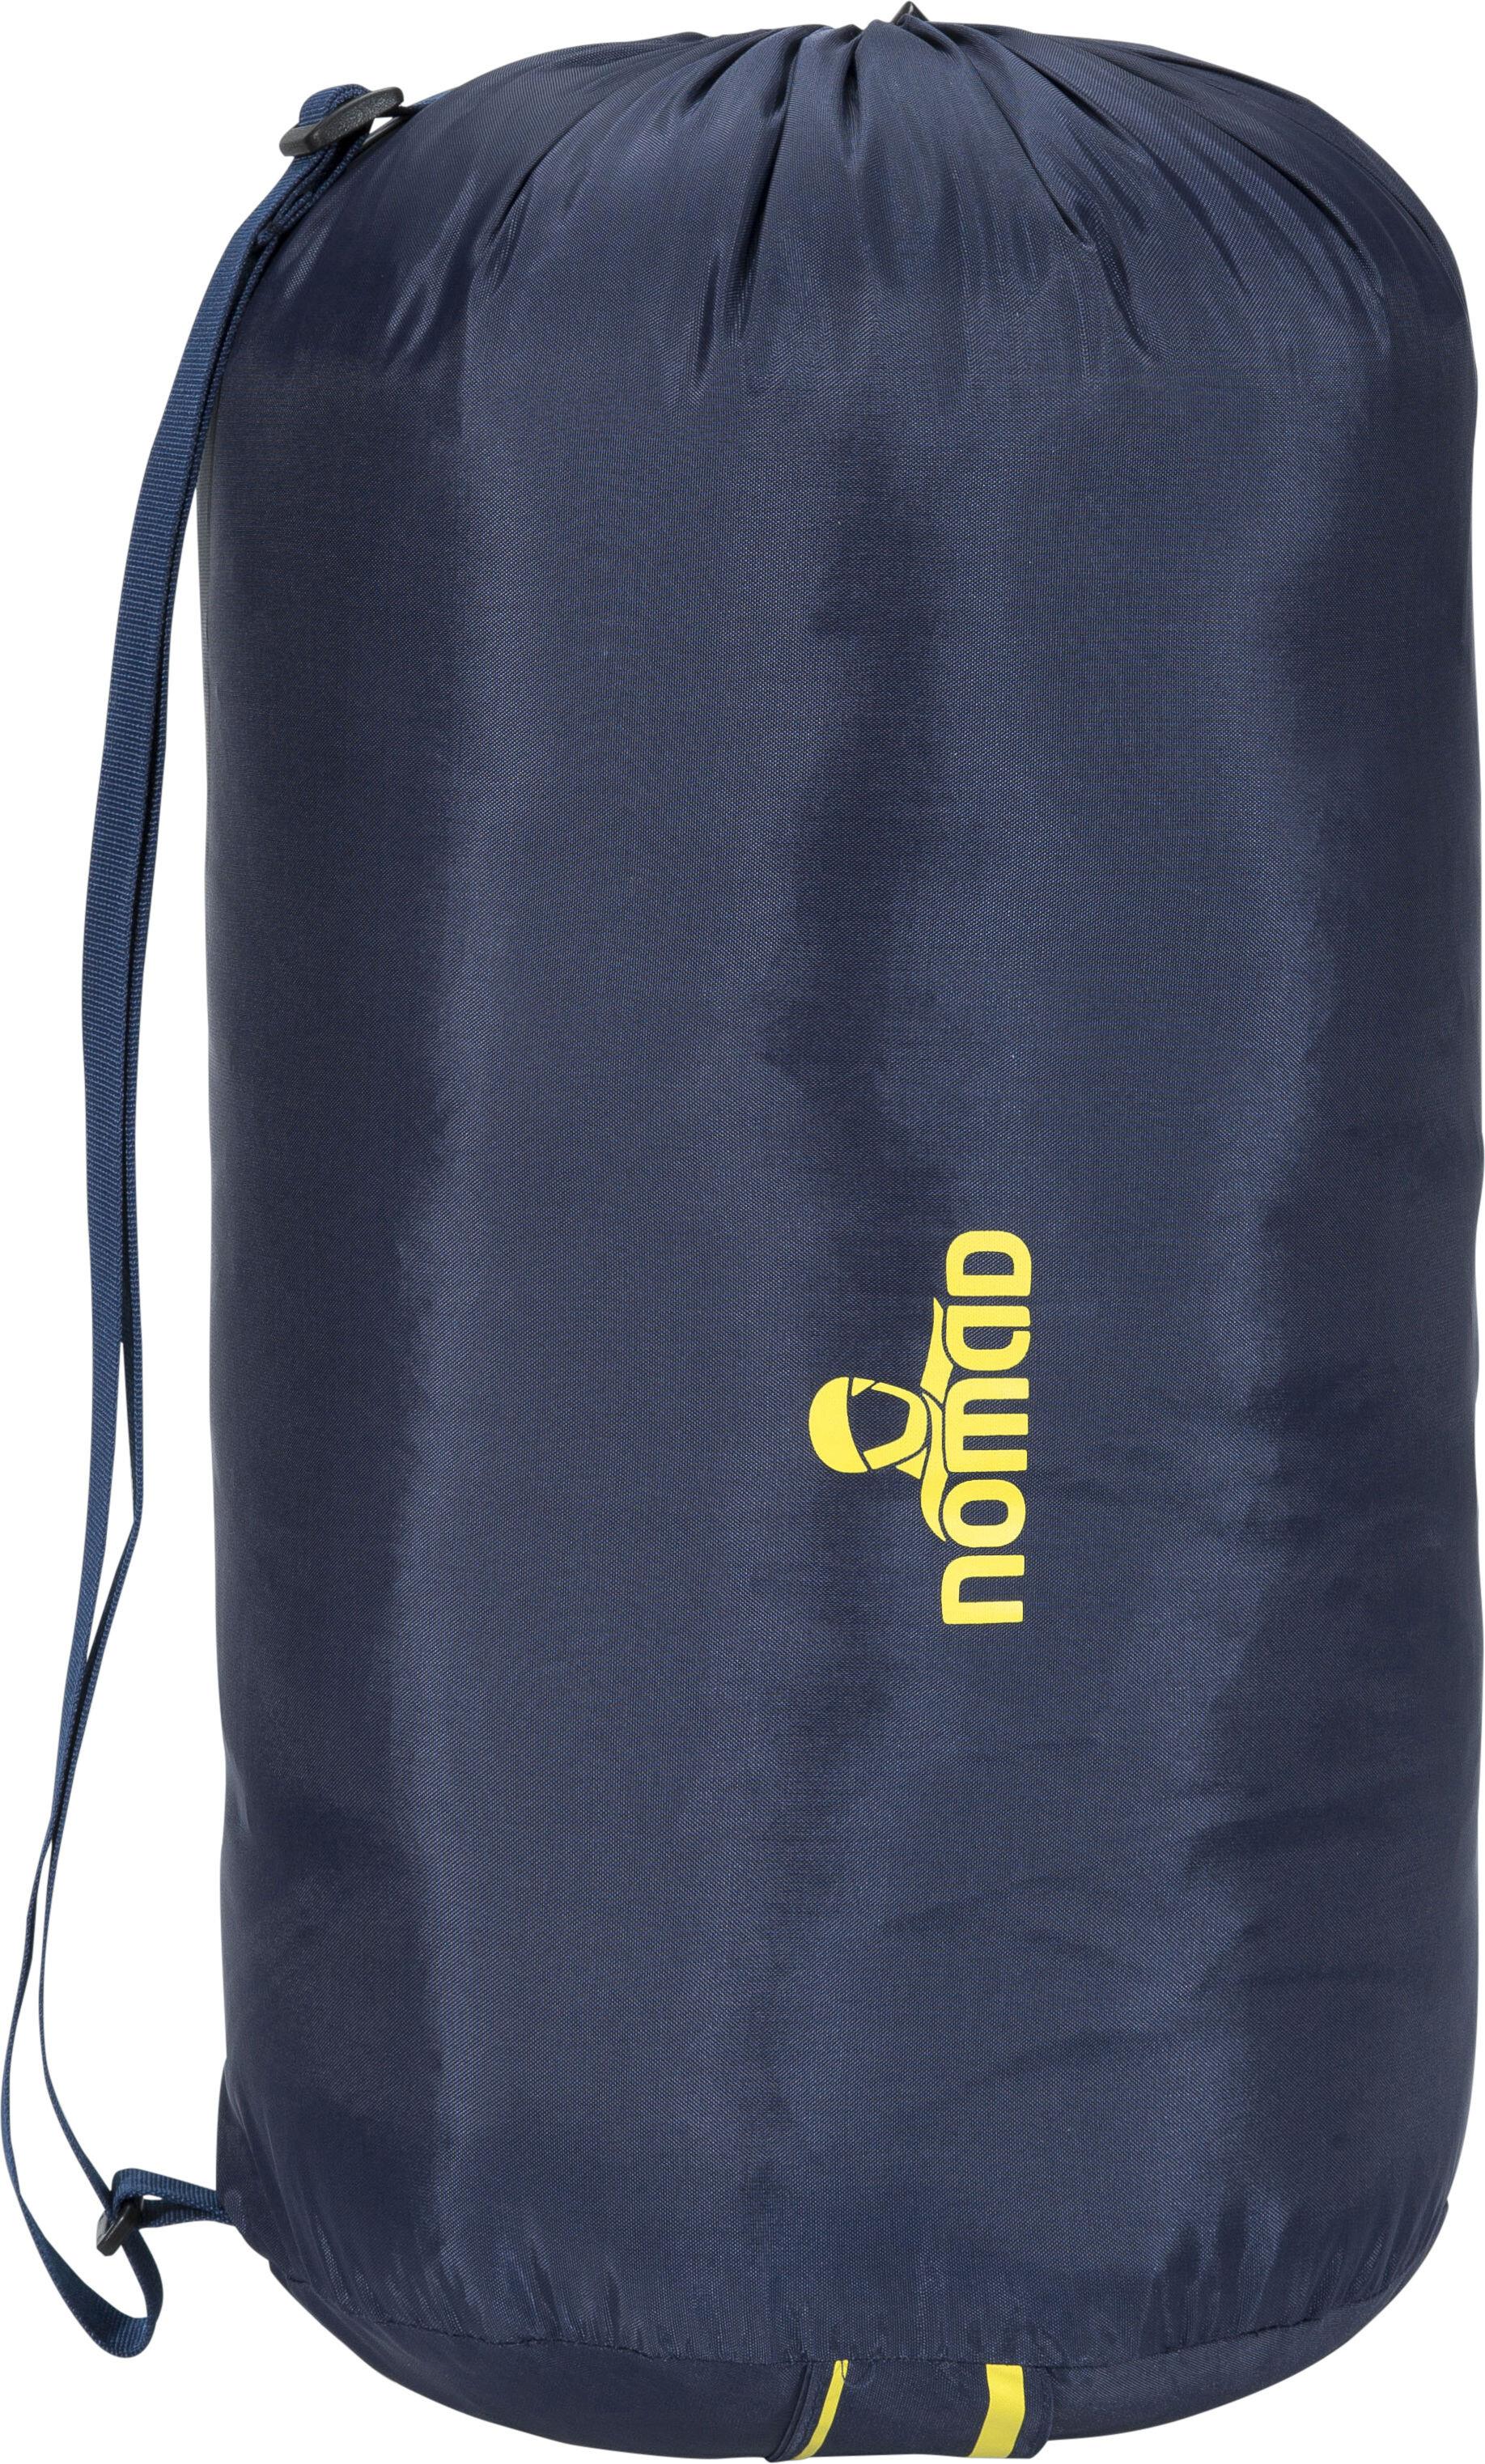 Nomad Blazer Classic XL fibres synthétiques de Plafond Sac de couchage Dark Navy//Dark Sand